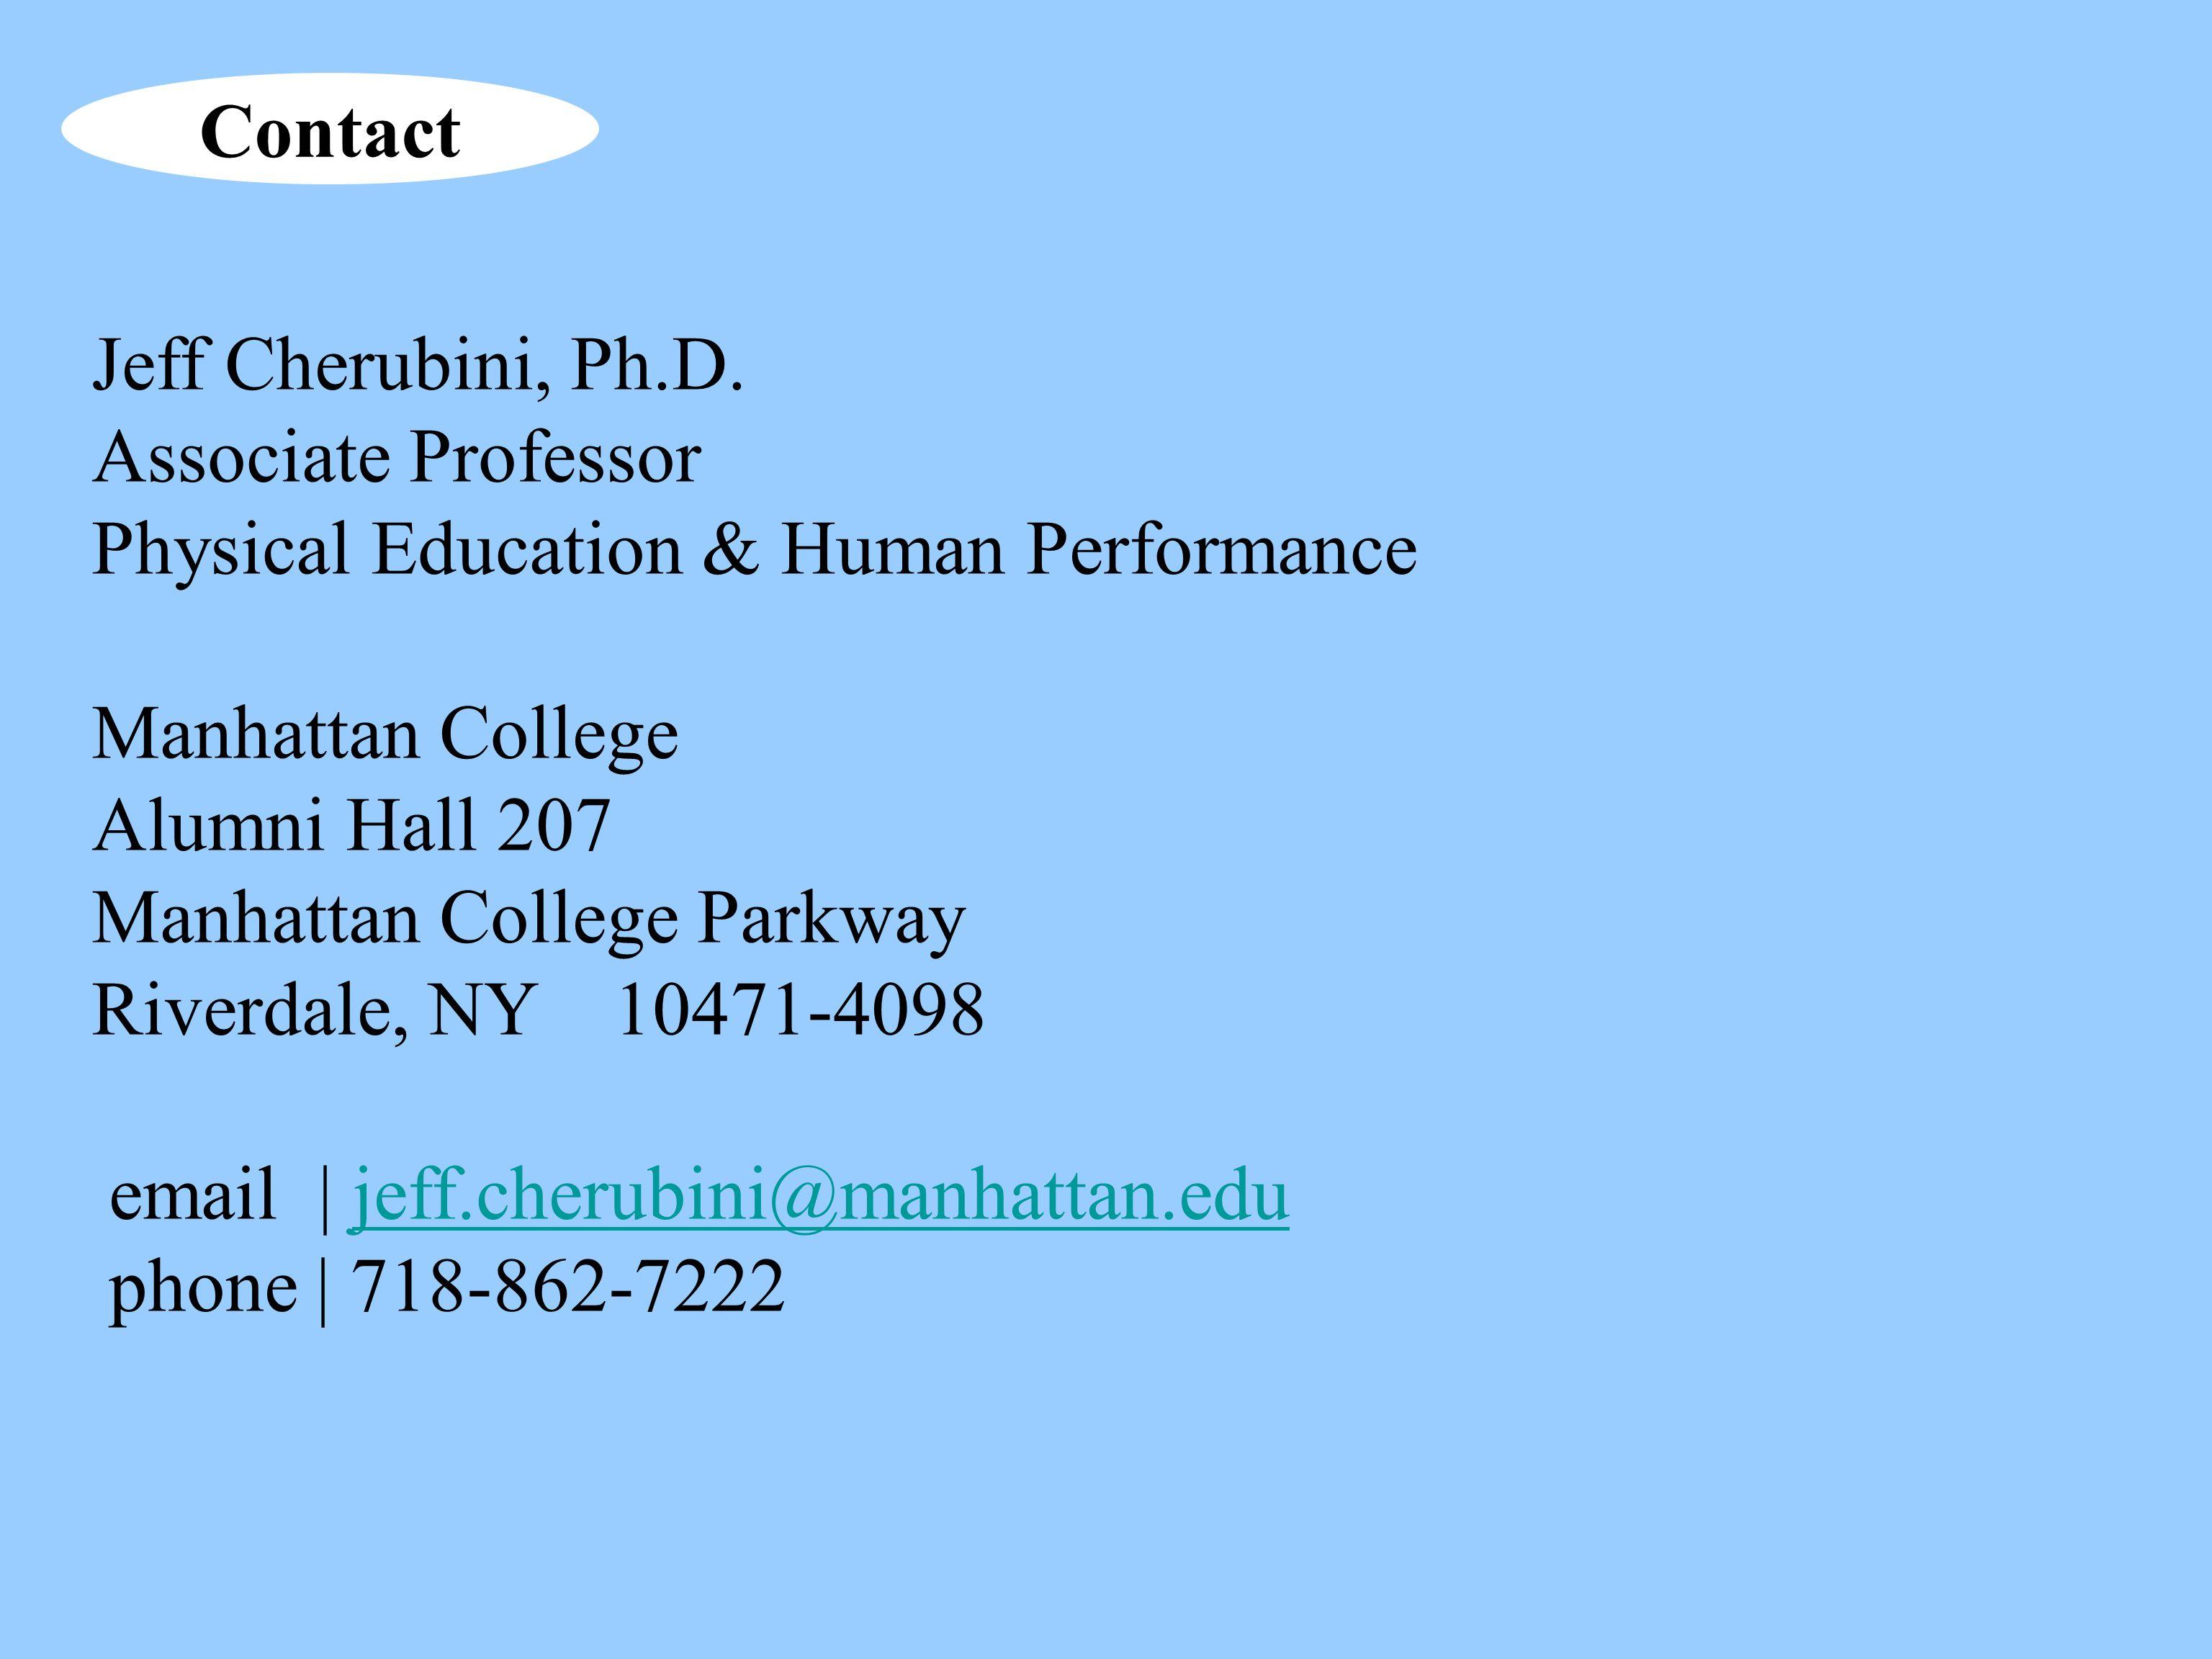 Jeff Cherubini, Ph.D.